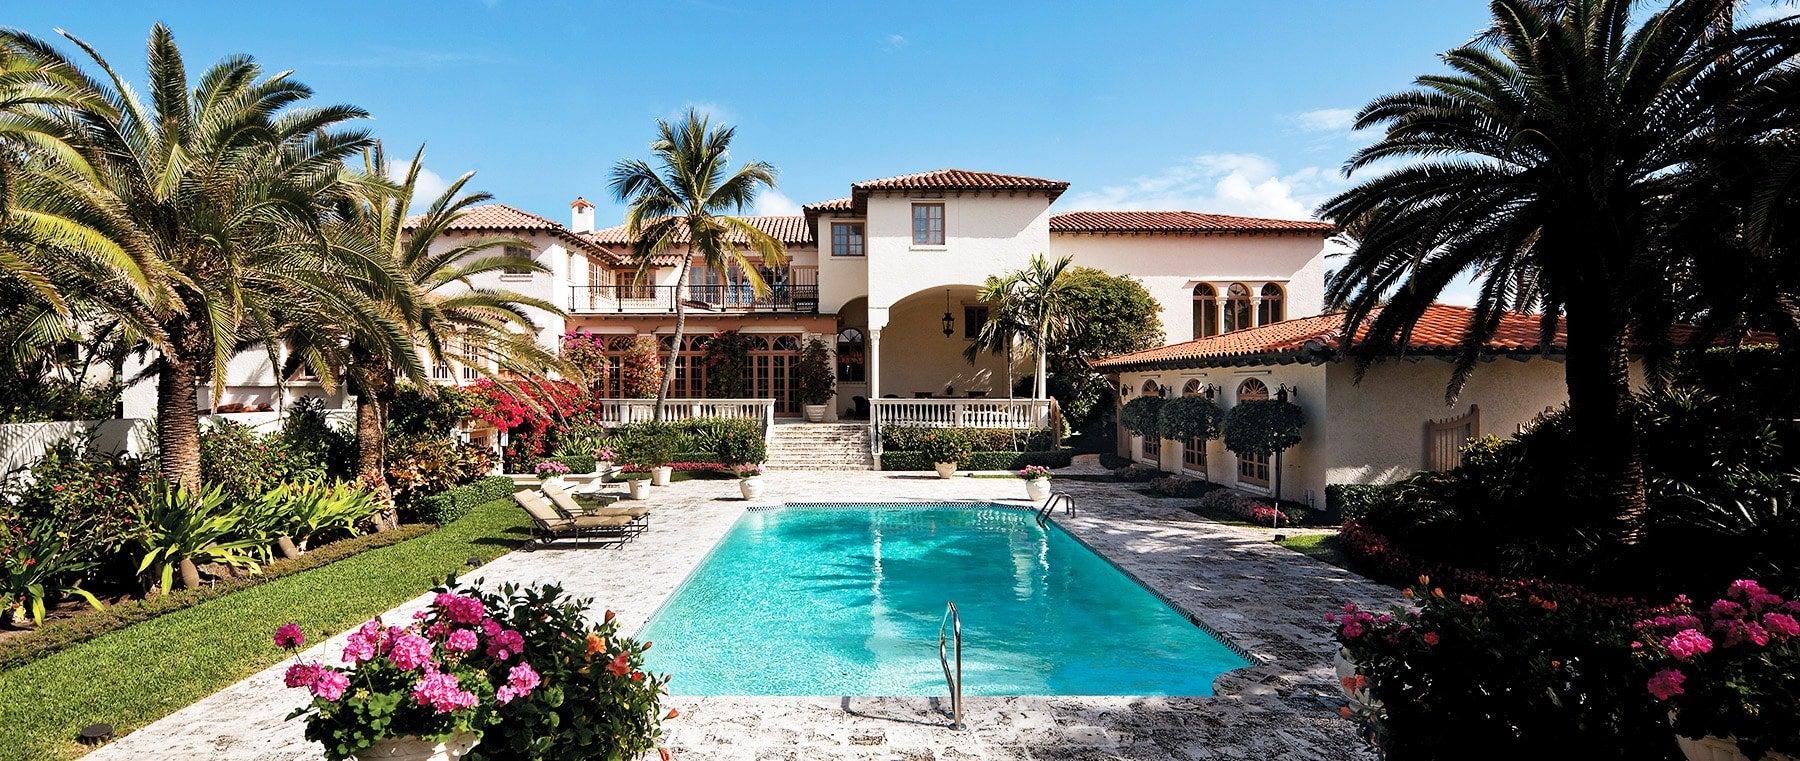 Pool and Garden of El Solano, Designed by Mizner